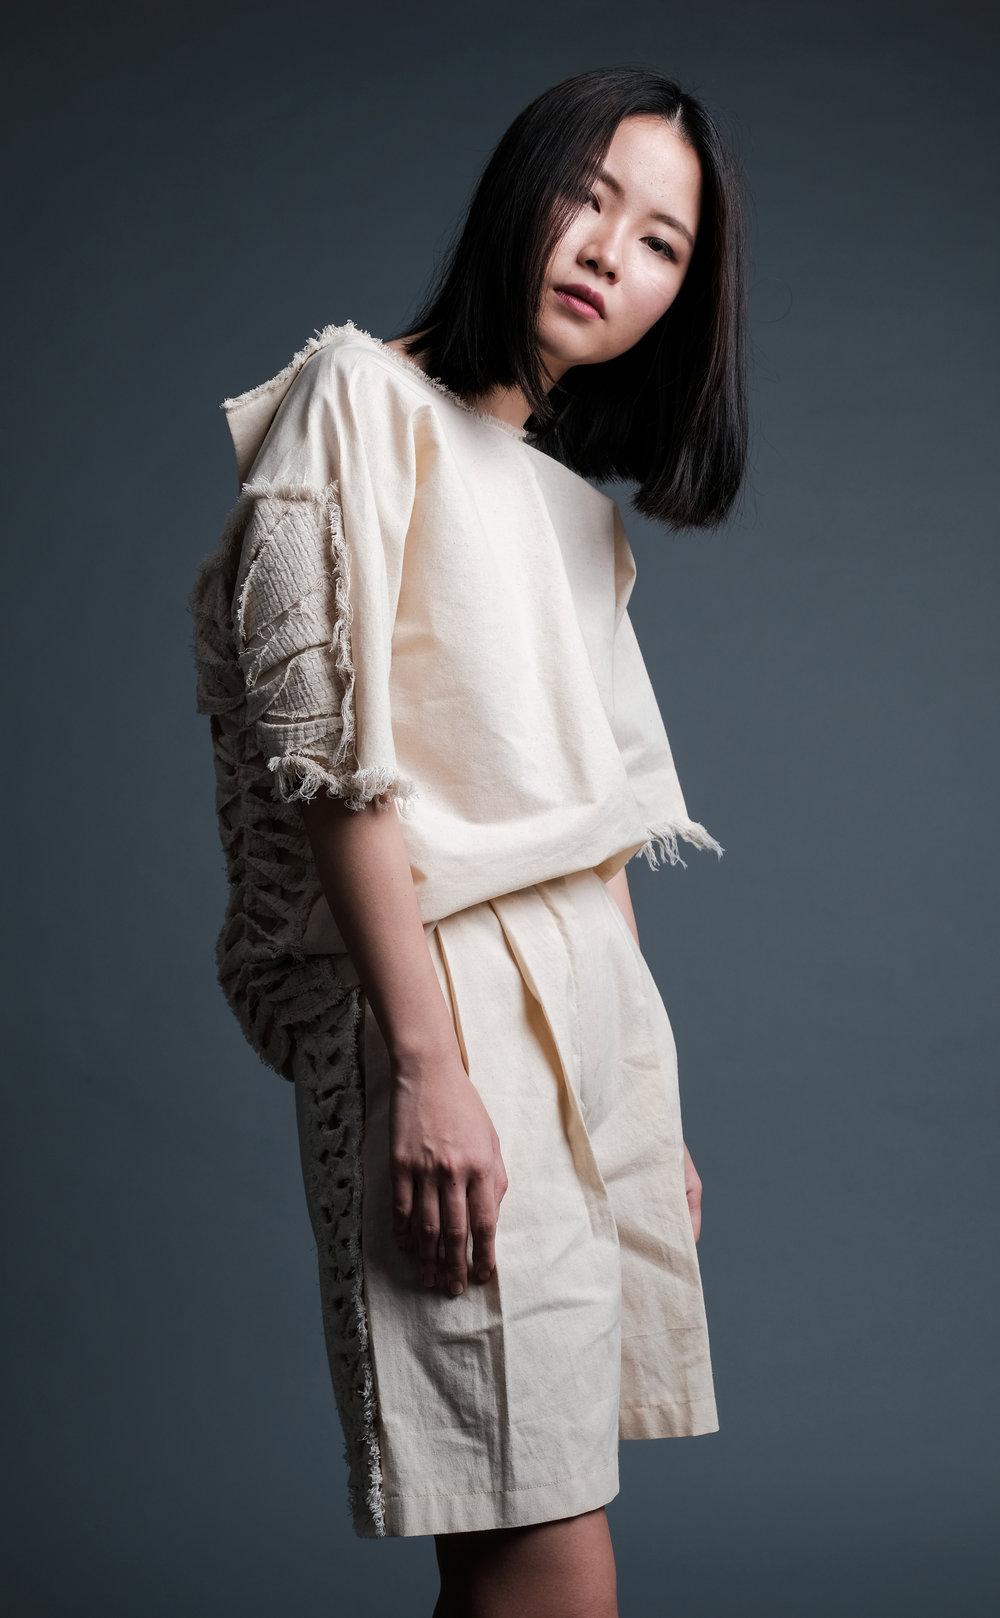 Studio Fashion Portraiture